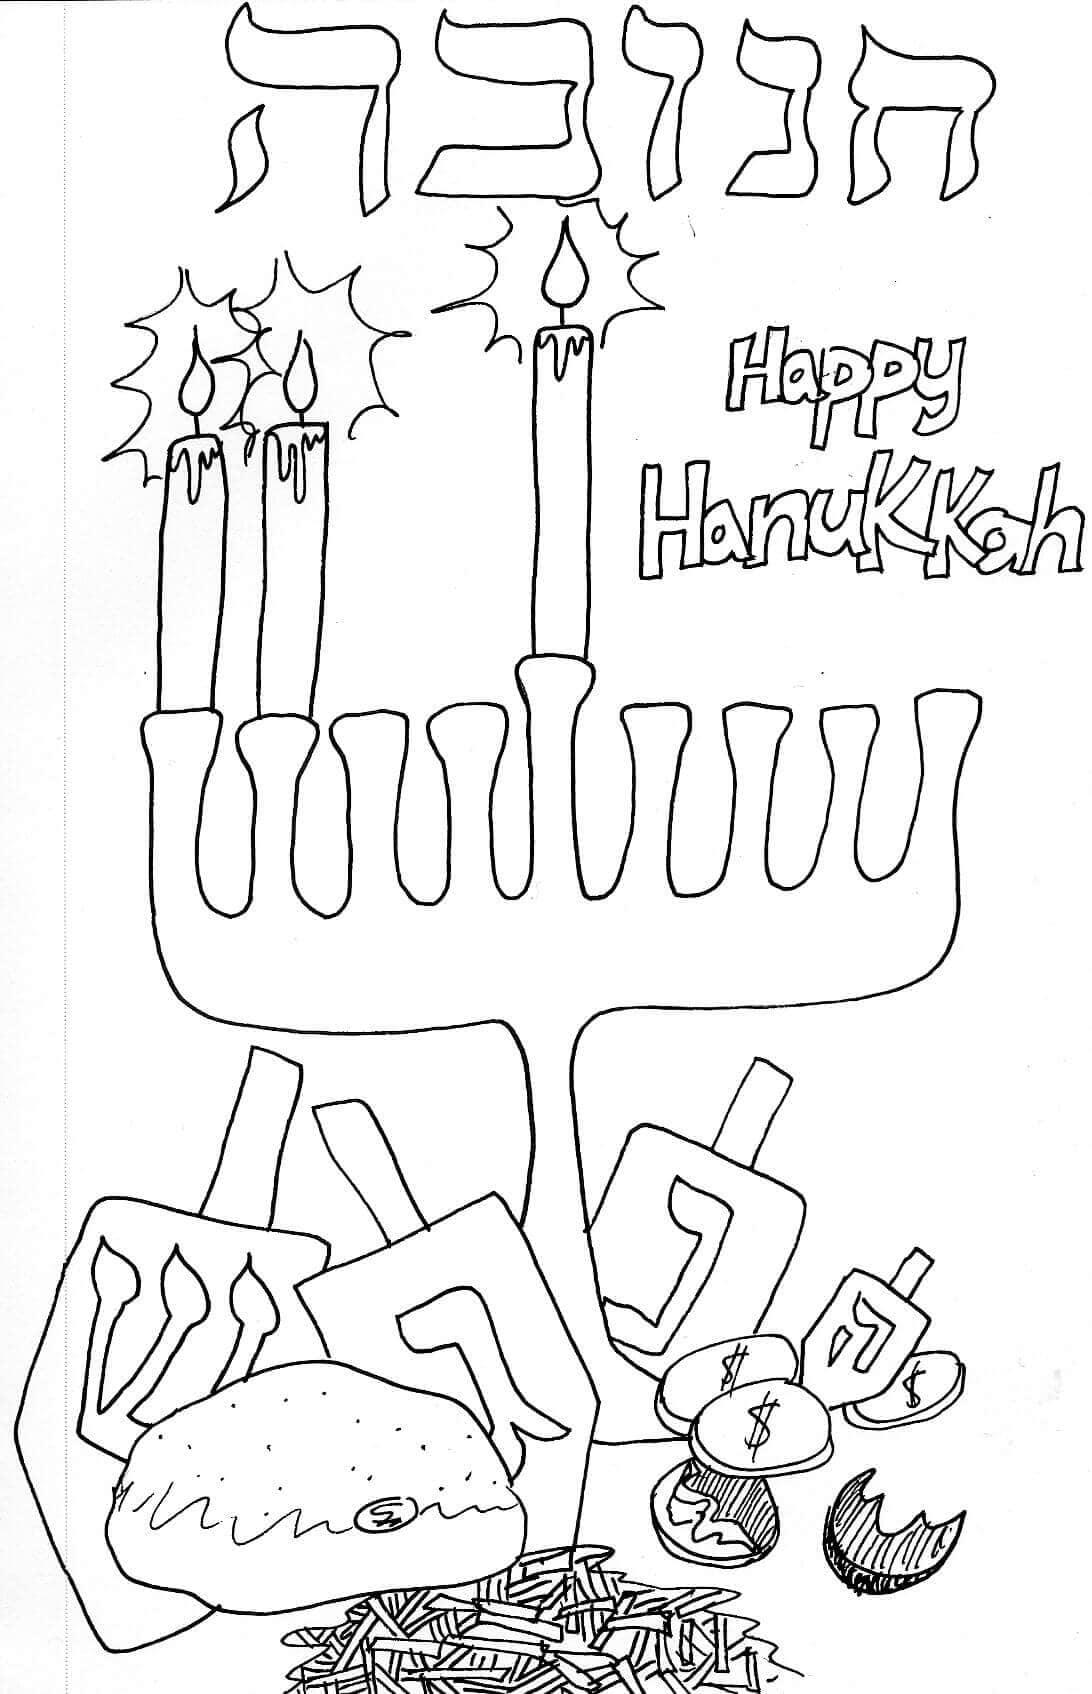 30 Free Hanukkah Coloring Pages Printable